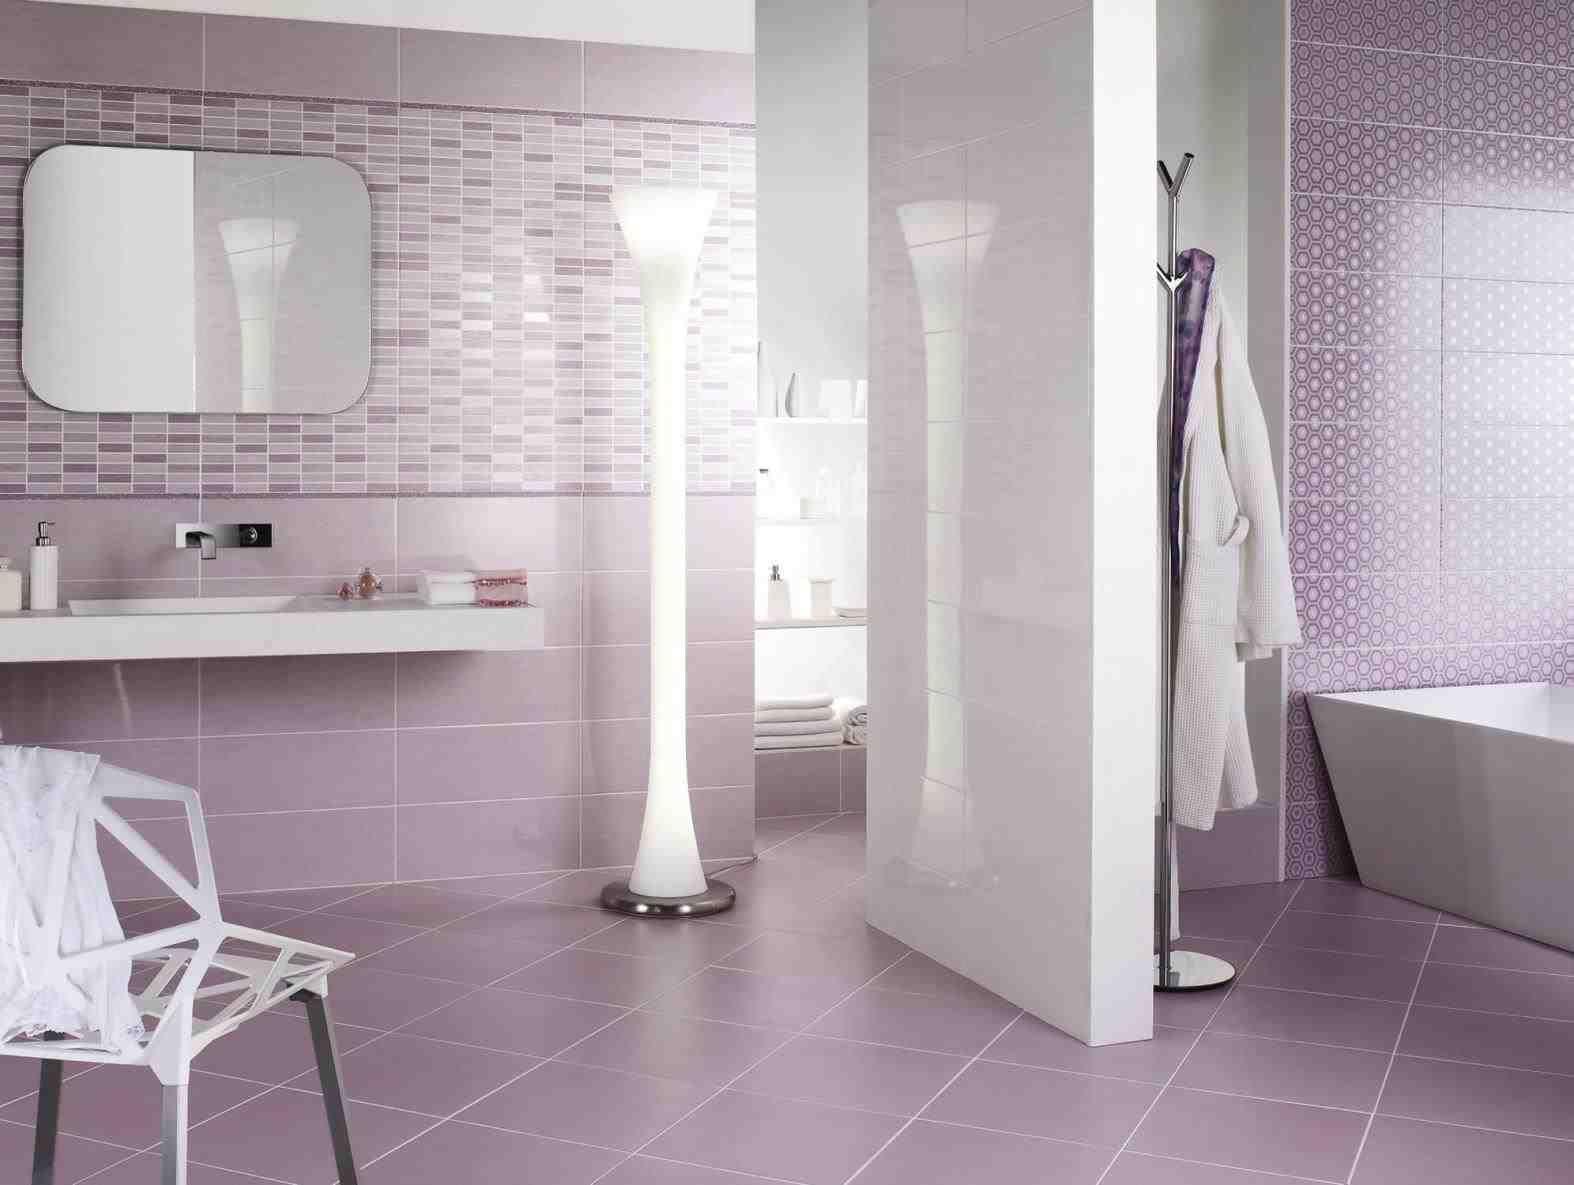 New Post tiles for bathroom walls and floors | Decors Ideas ...